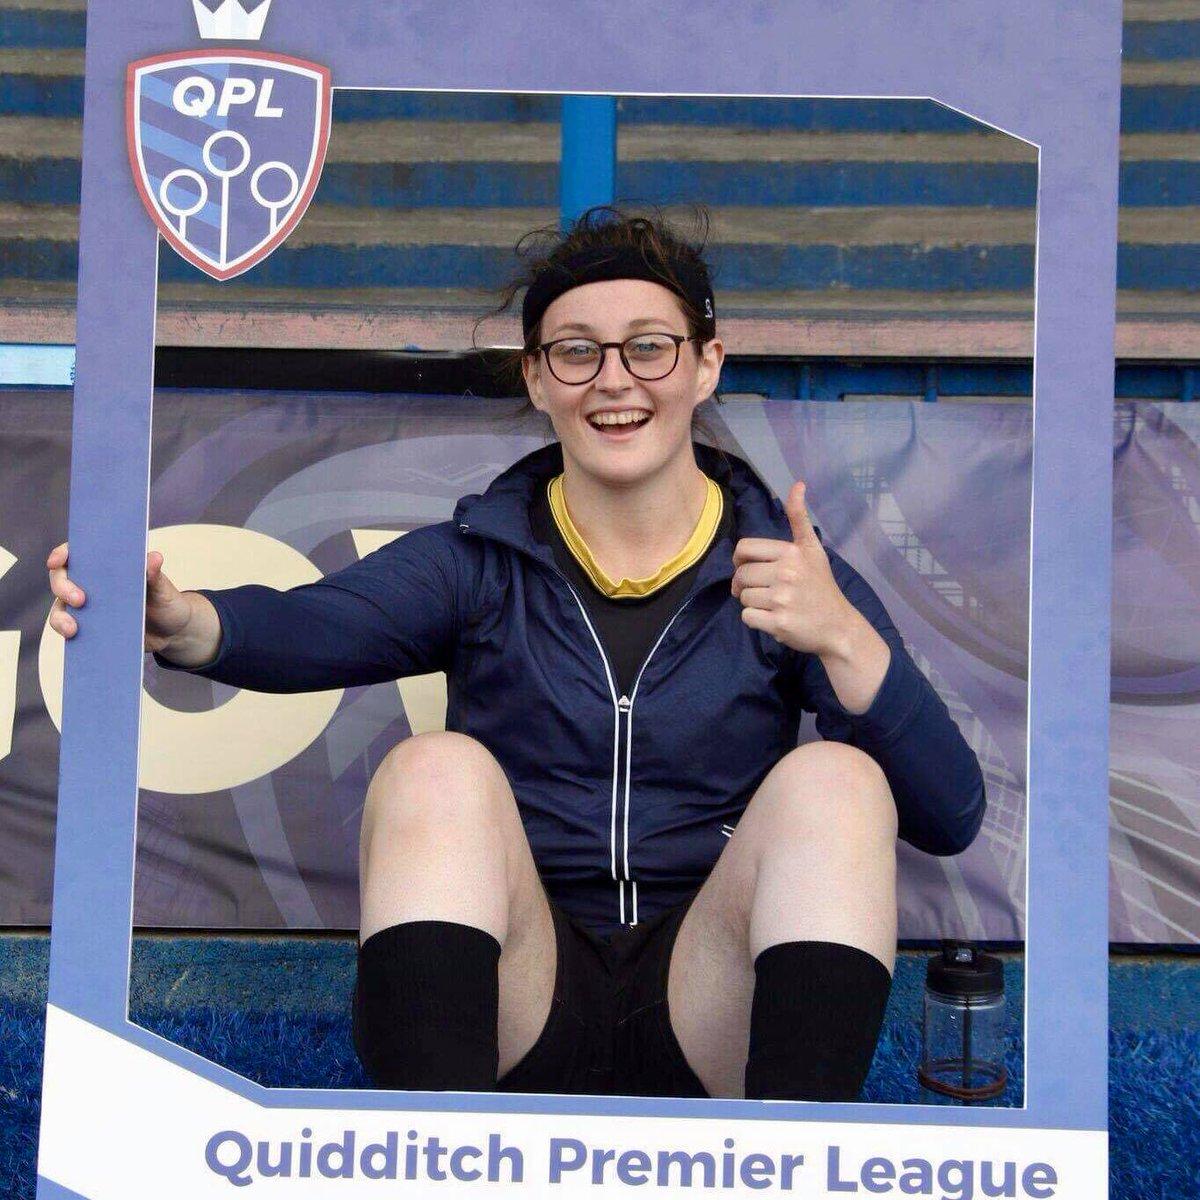 Quidditch Premier League's photo on TEAM NEWS